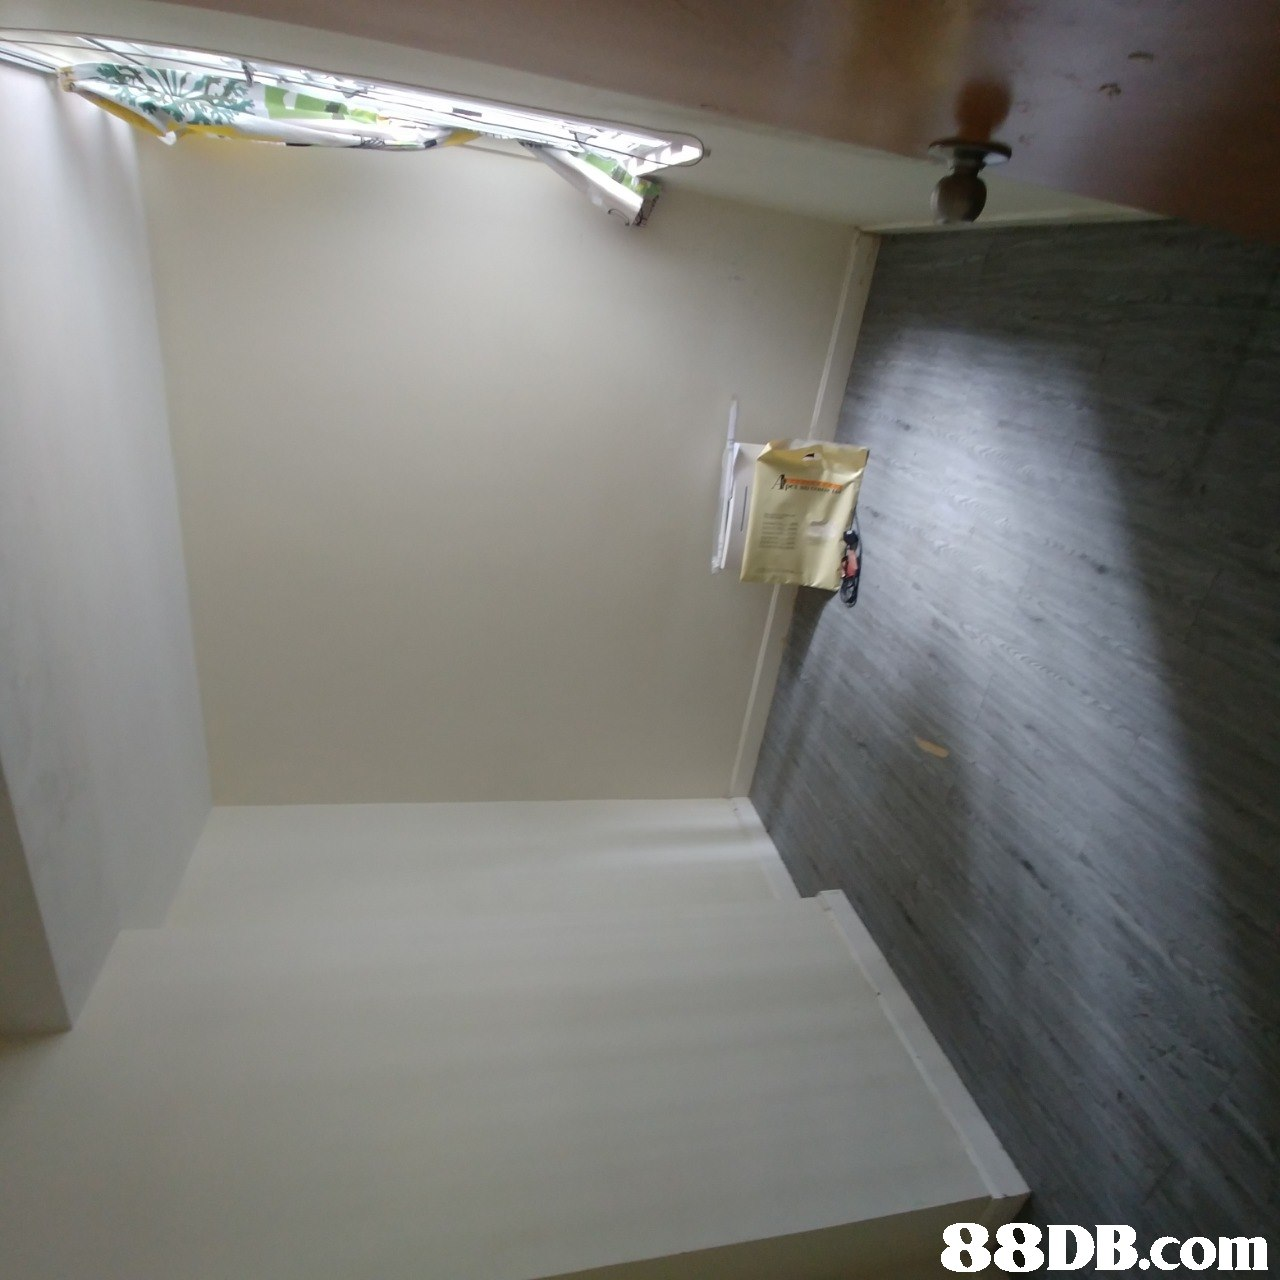 property,room,ceiling,floor,wall